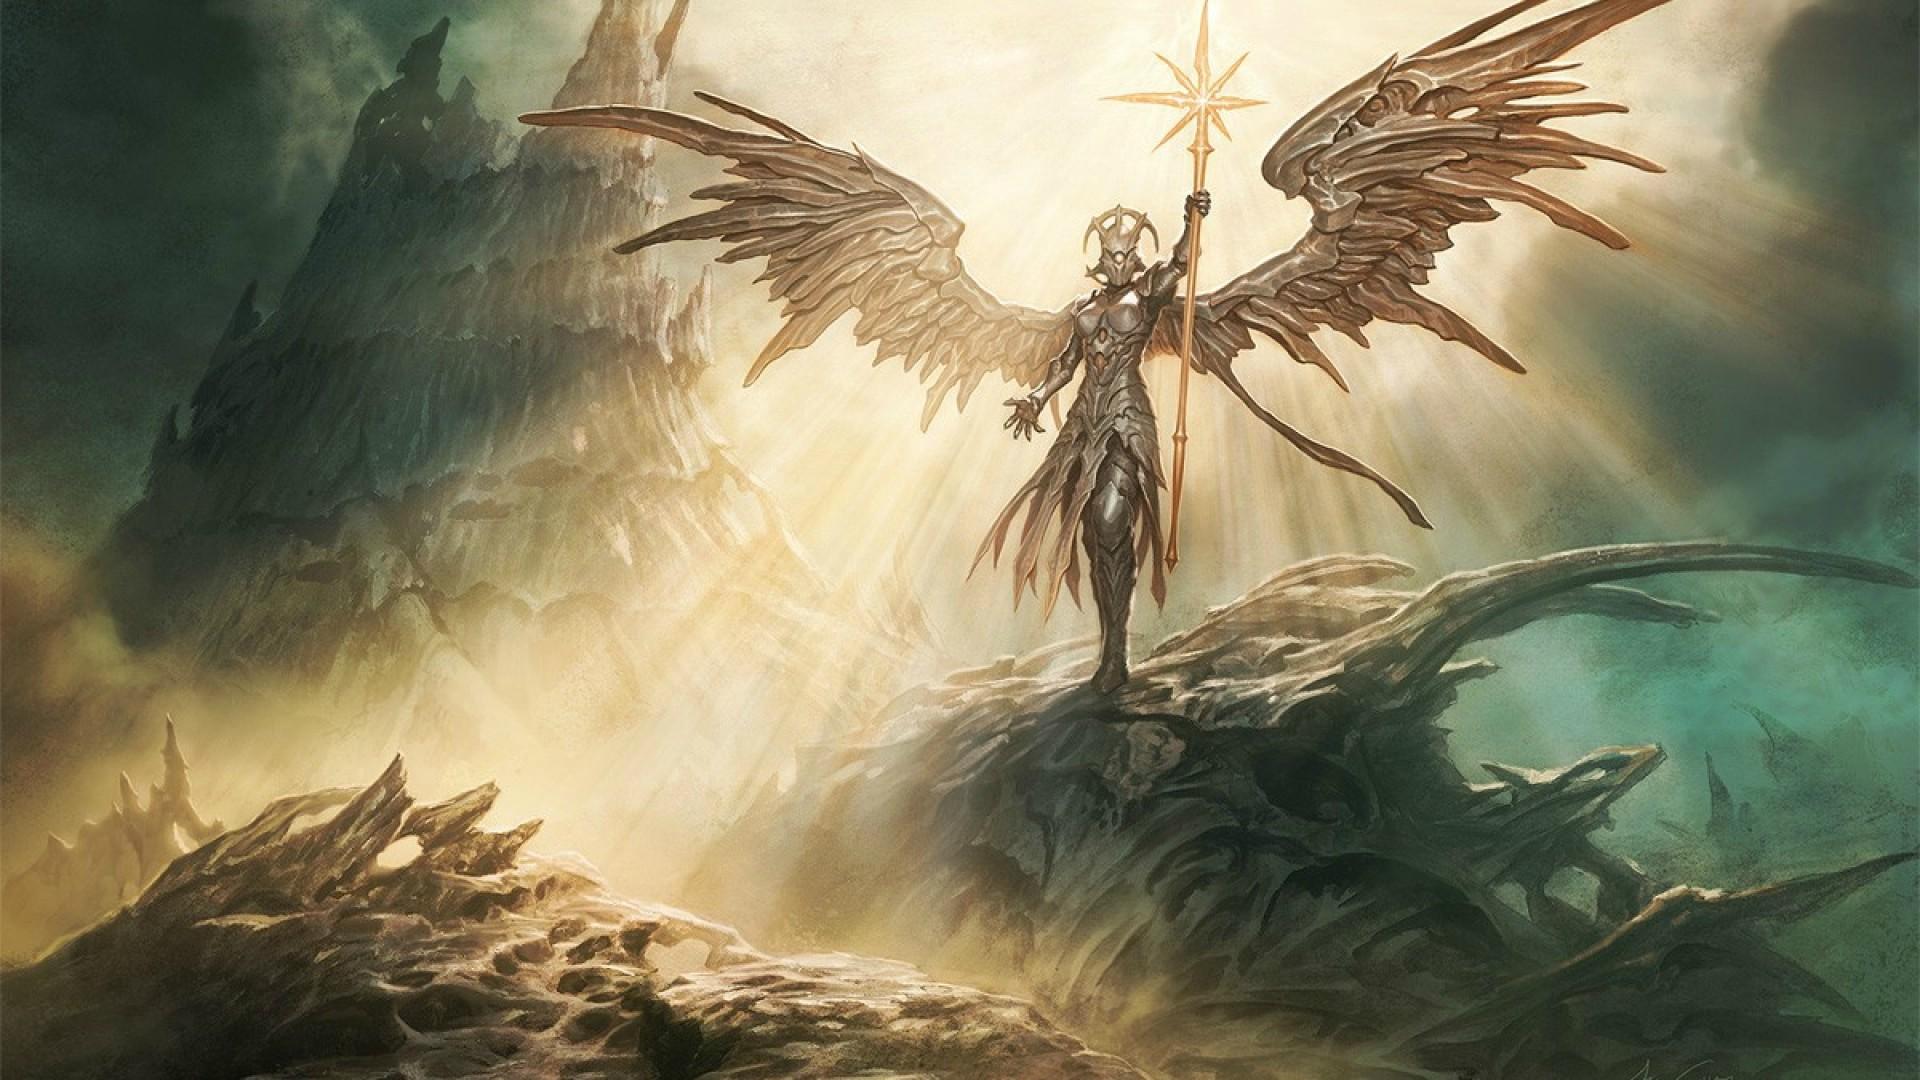 Artwork Fantasy Art Angel Wallpapers Hd Desktop And: Sunblast Angel HD Wallpaper